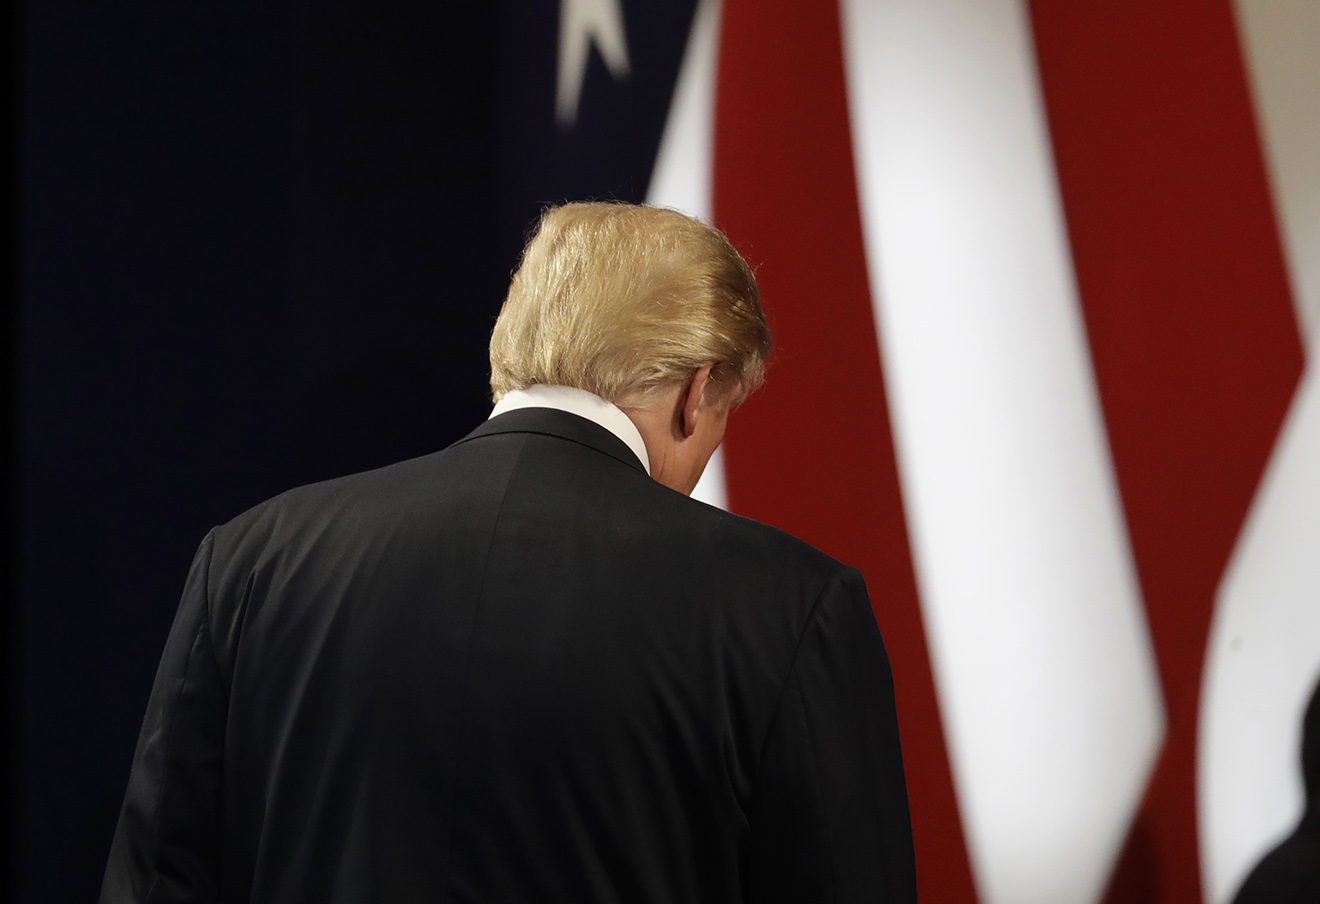 Дональд Трамп, 19 октября 2016 года. Фото: Patrick Semansky / AP